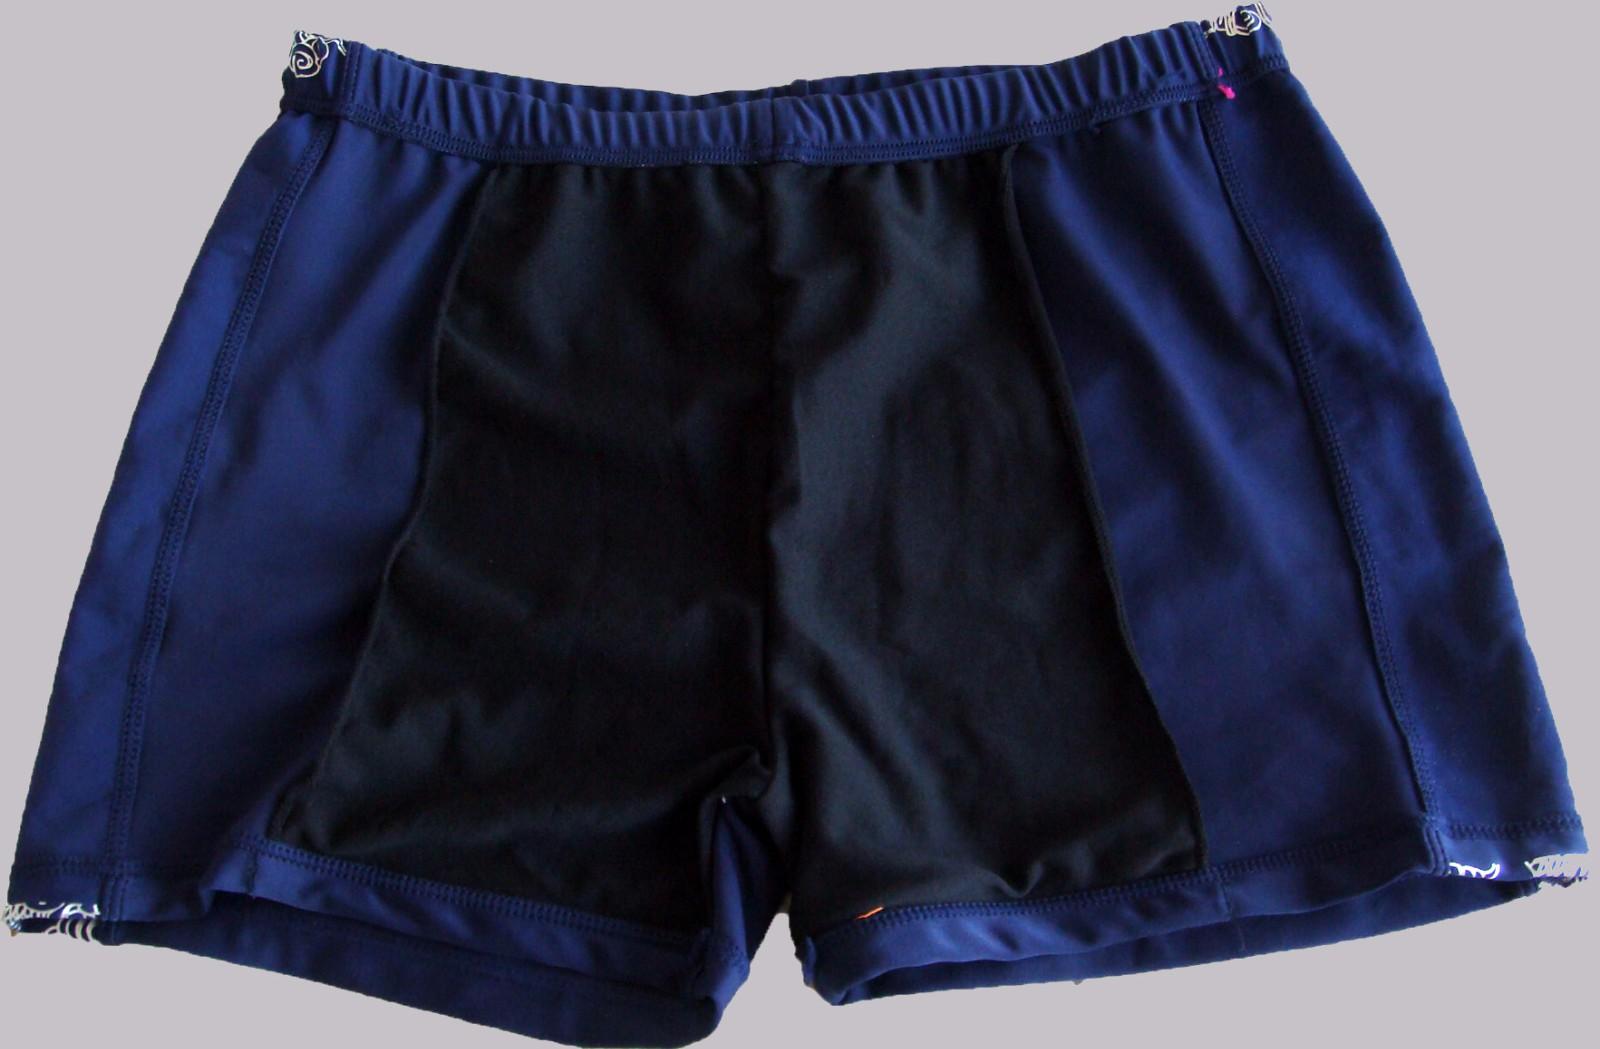 boxer short Manufacturers, boxer short Factory, Supply boxer short